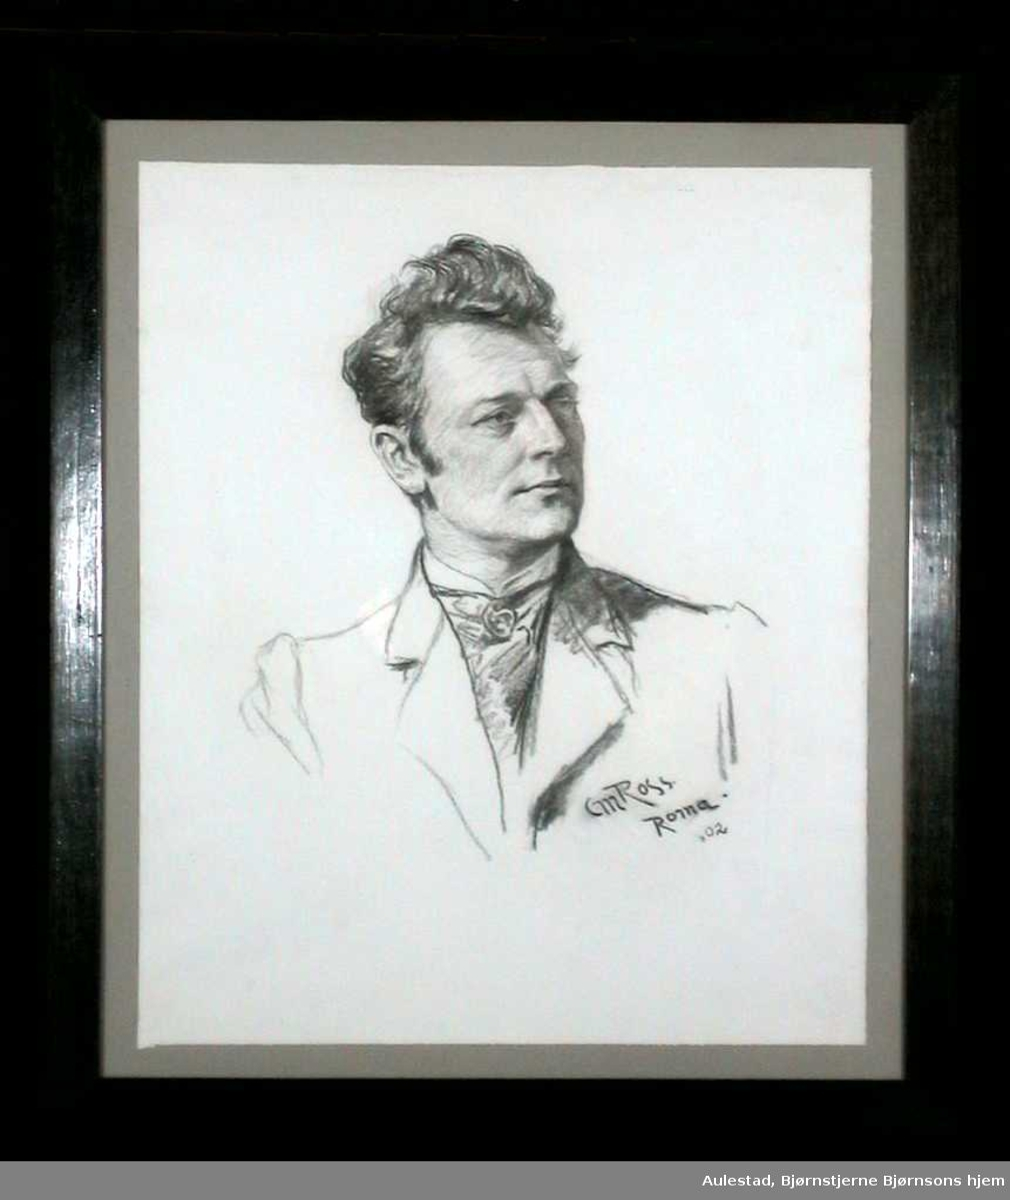 Portrett av ung mann i profil.